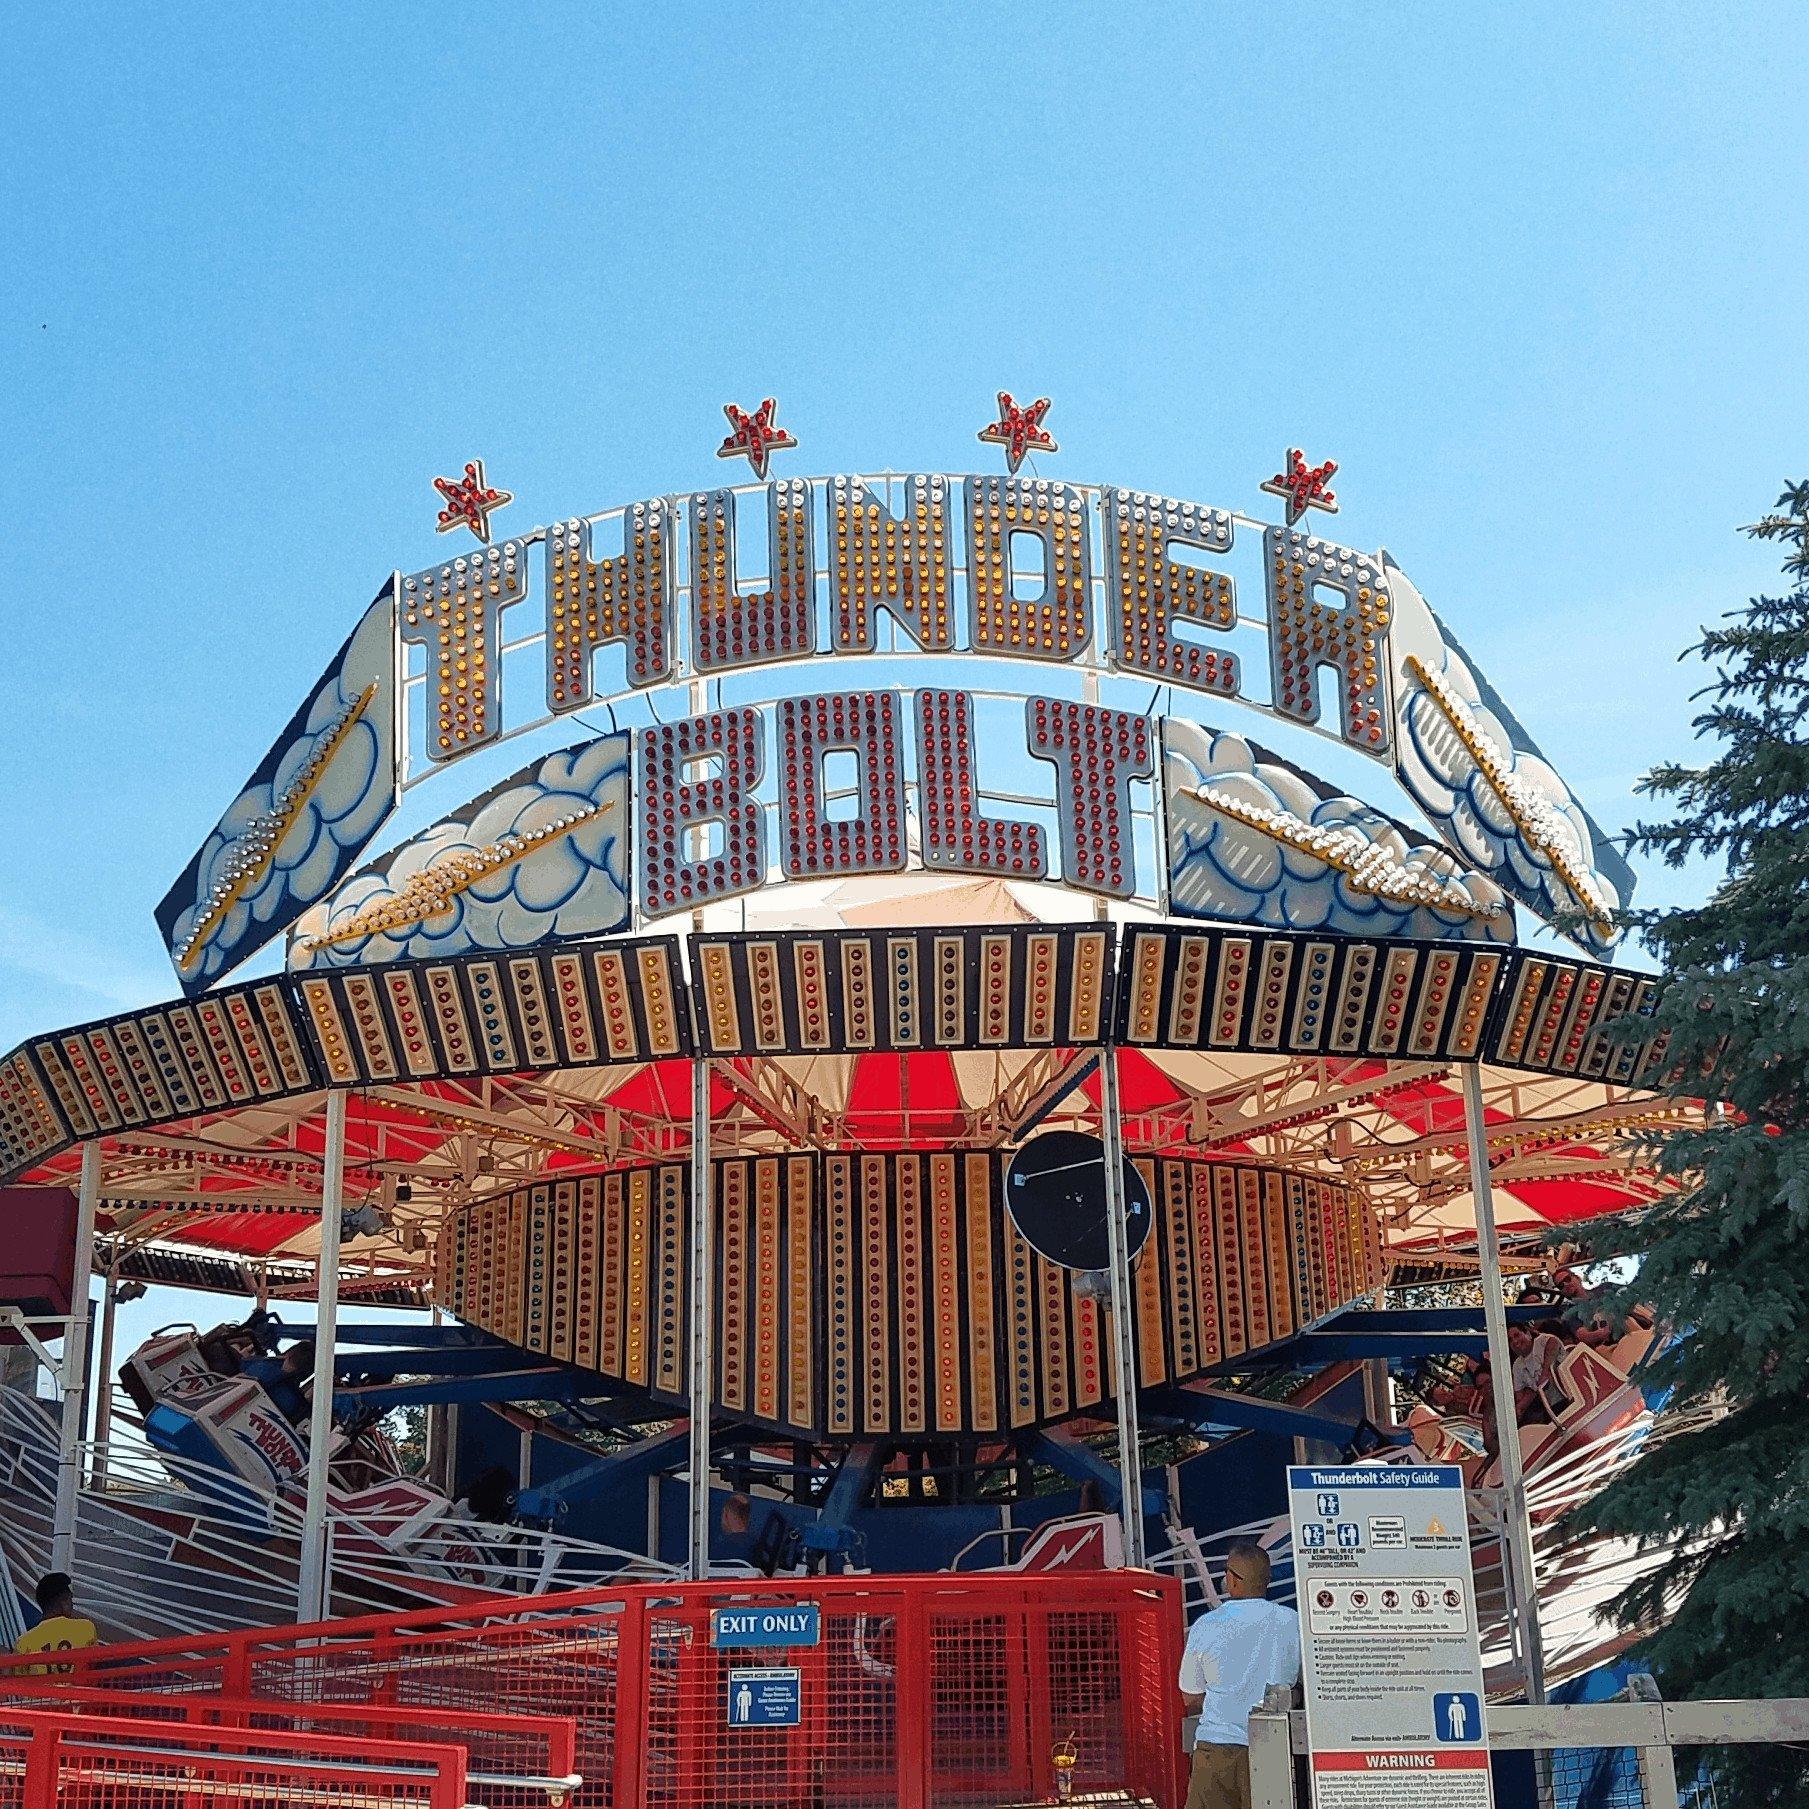 Michigan adventure amusement park rides